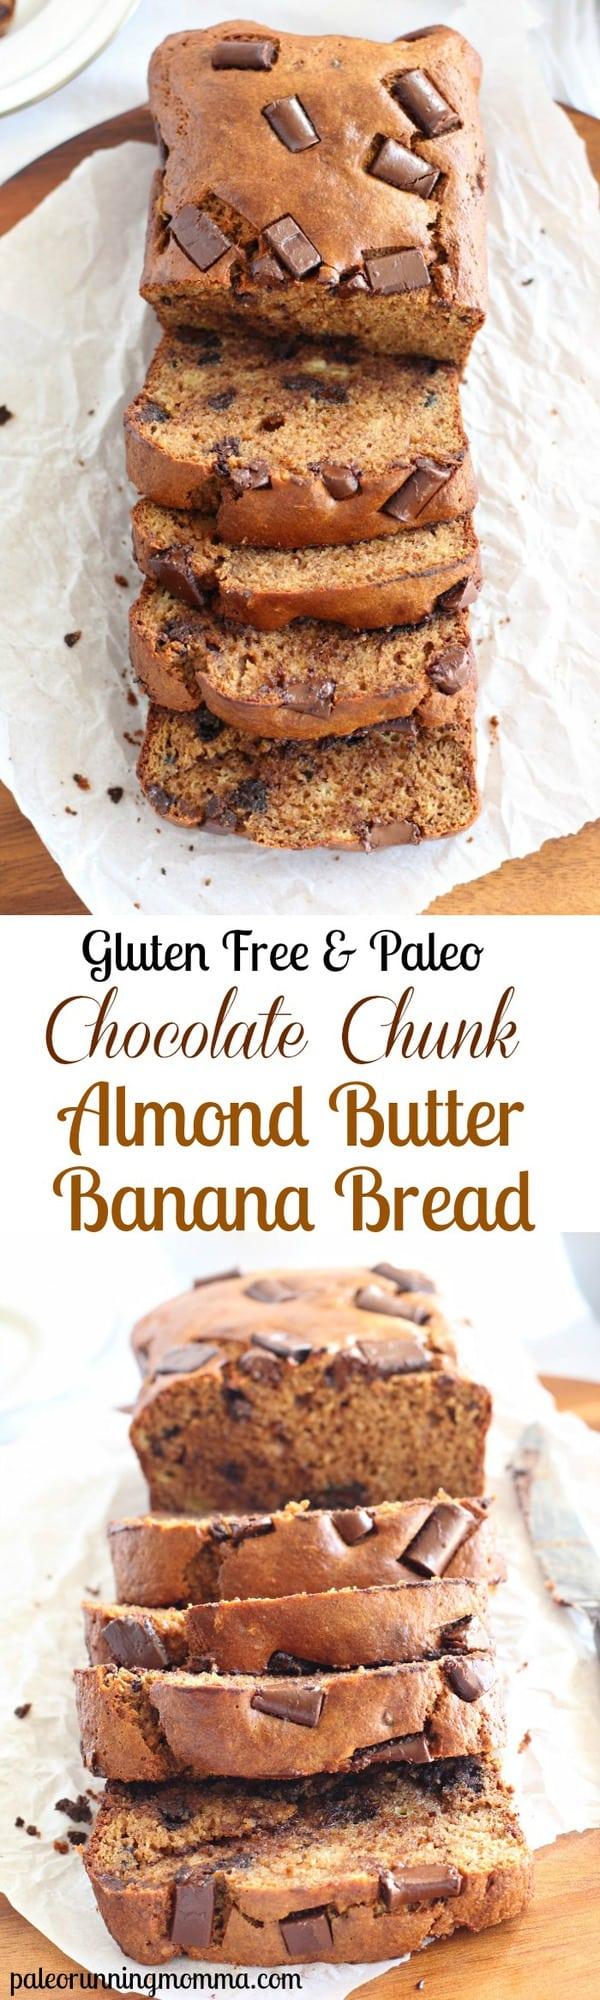 Chocolate Chunk Almond Butter Banana Bread - #glutenfree #grainfree #dairyfree #paleo